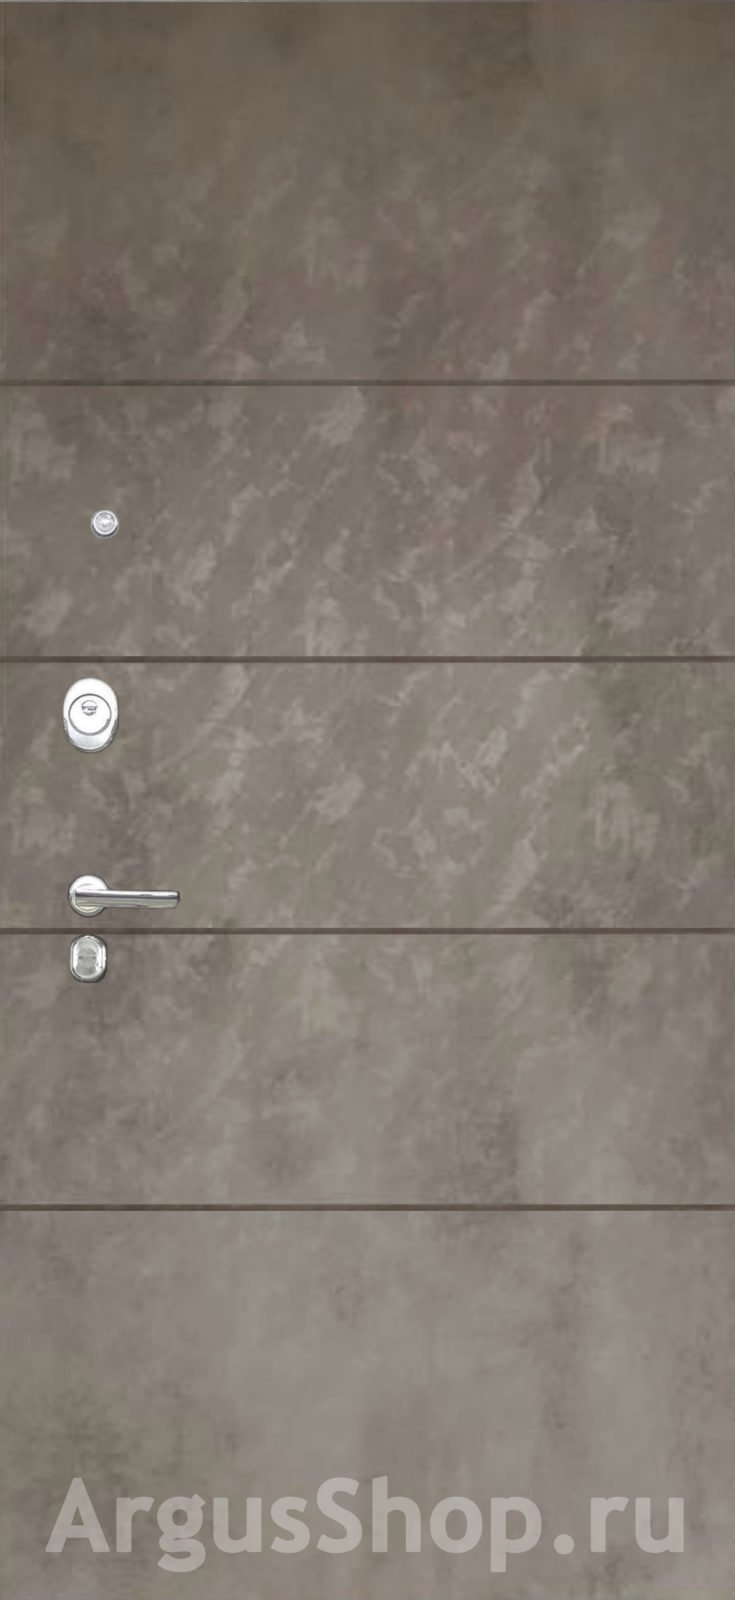 Двери Аргус Агат Тёмный бетон